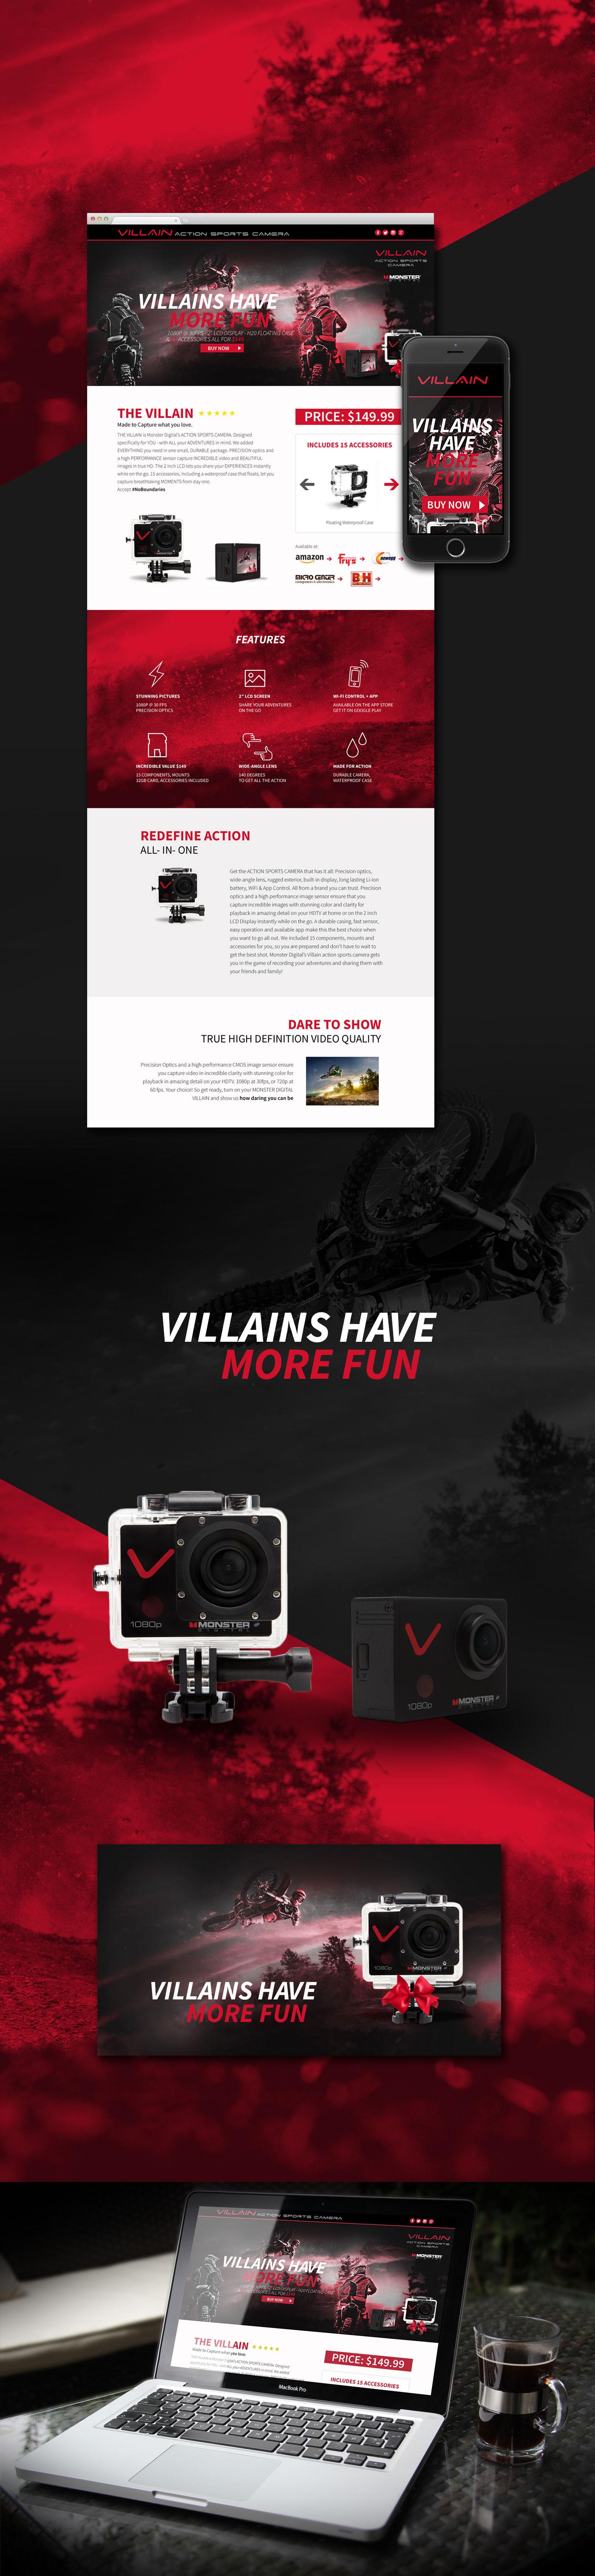 Projects_The-Villain-2.jpg